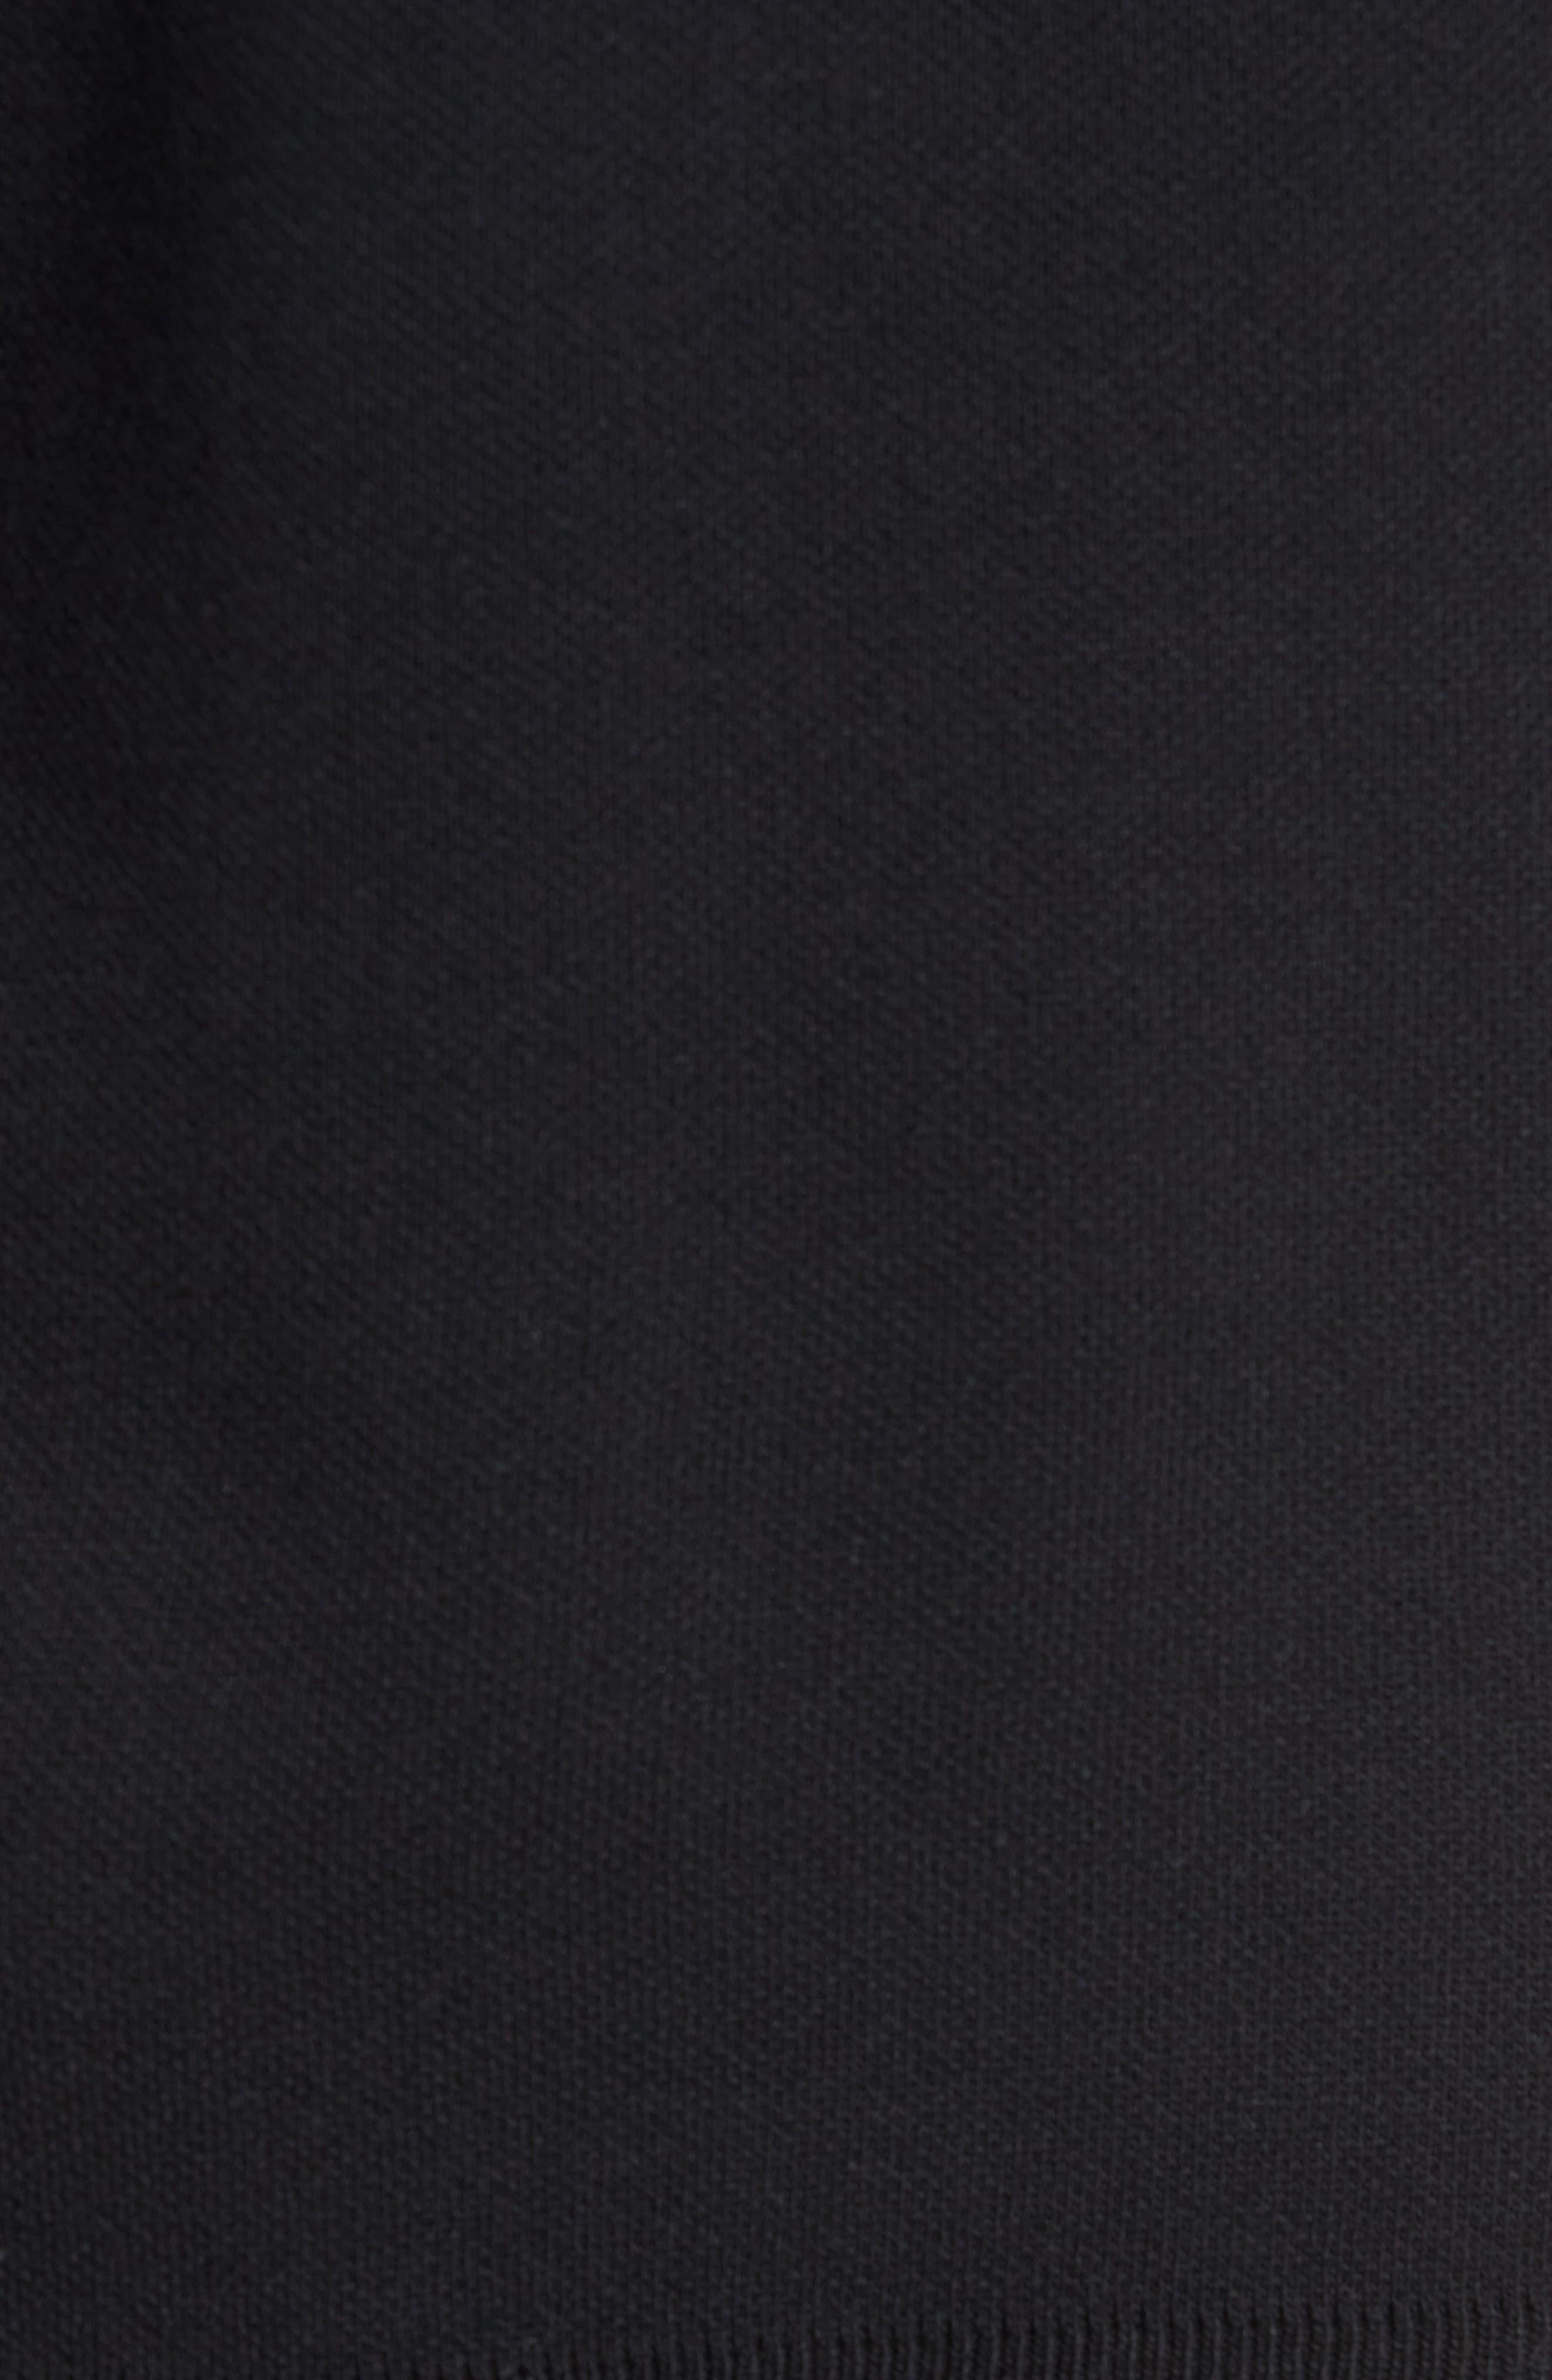 Lakra Regular Fit Half Zip Pullover,                             Alternate thumbnail 5, color,                             Black/Milk/Black